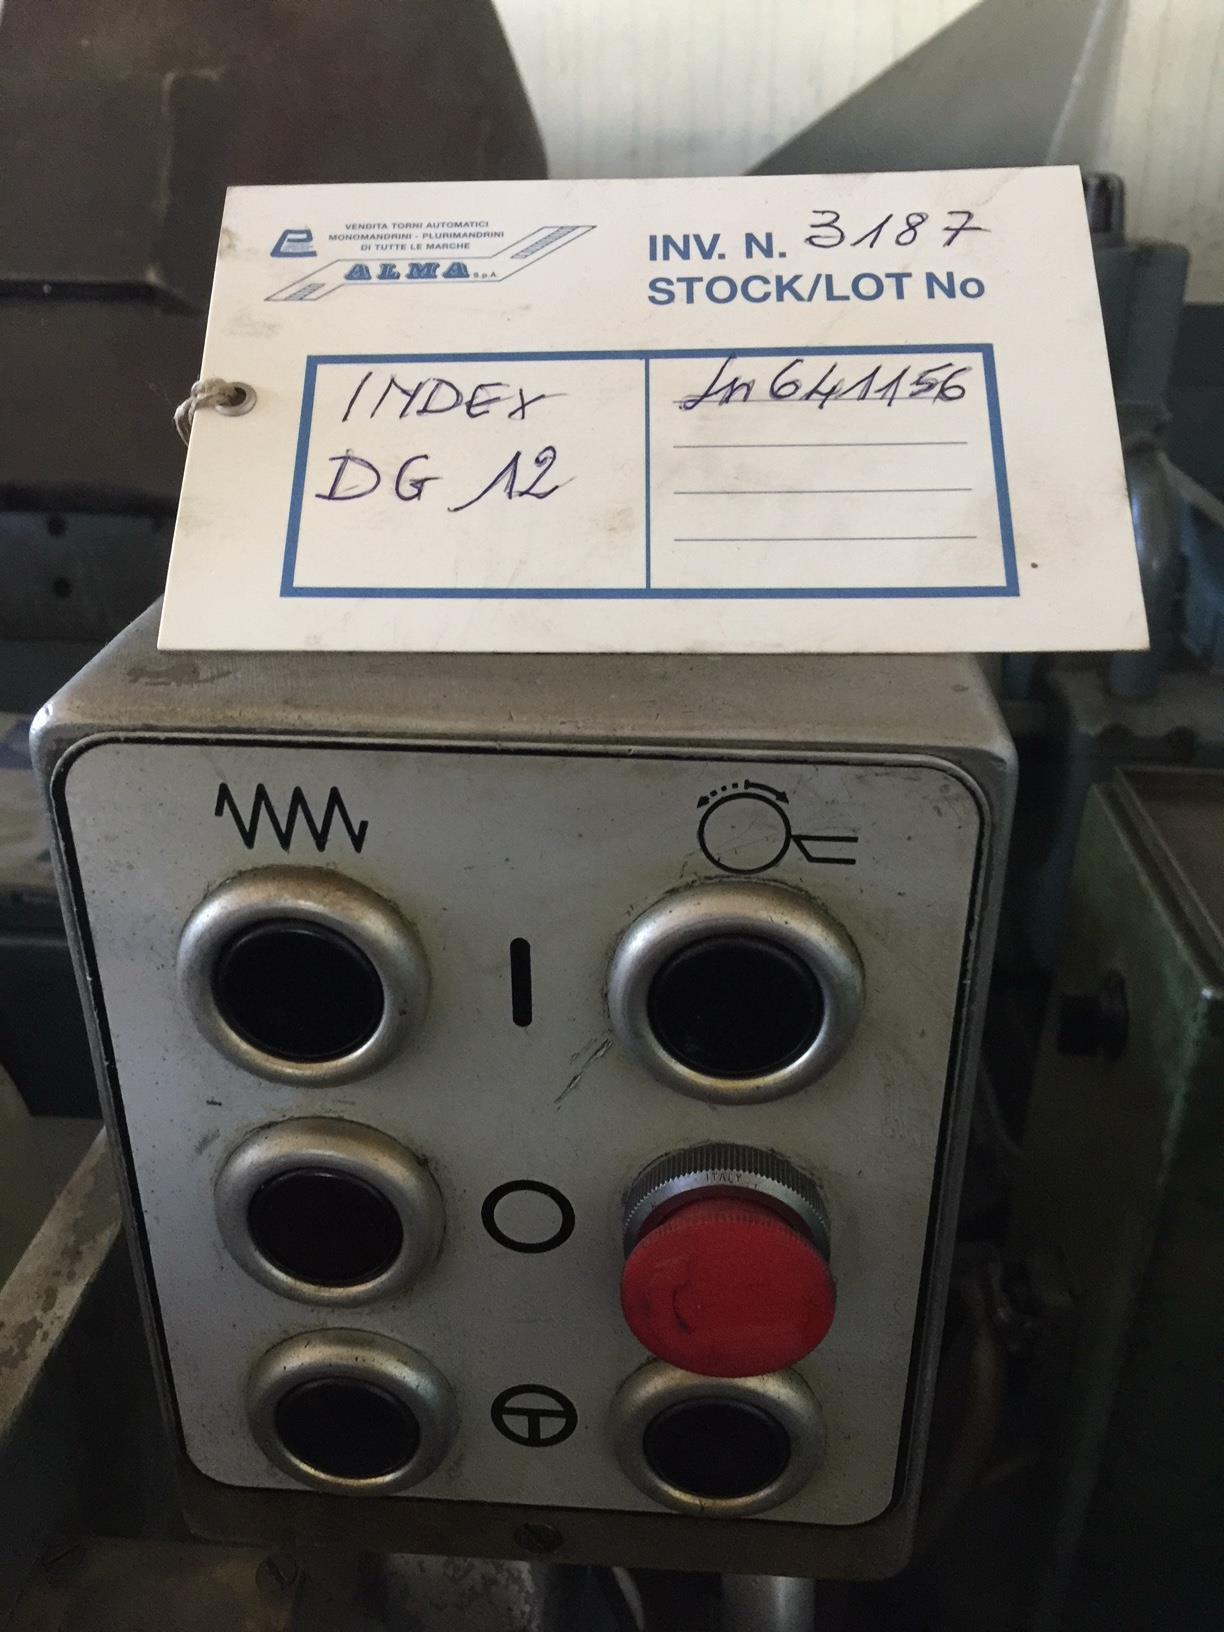 Lot 44 - Index Model DG 12, Single Spindle Automatic Lathe